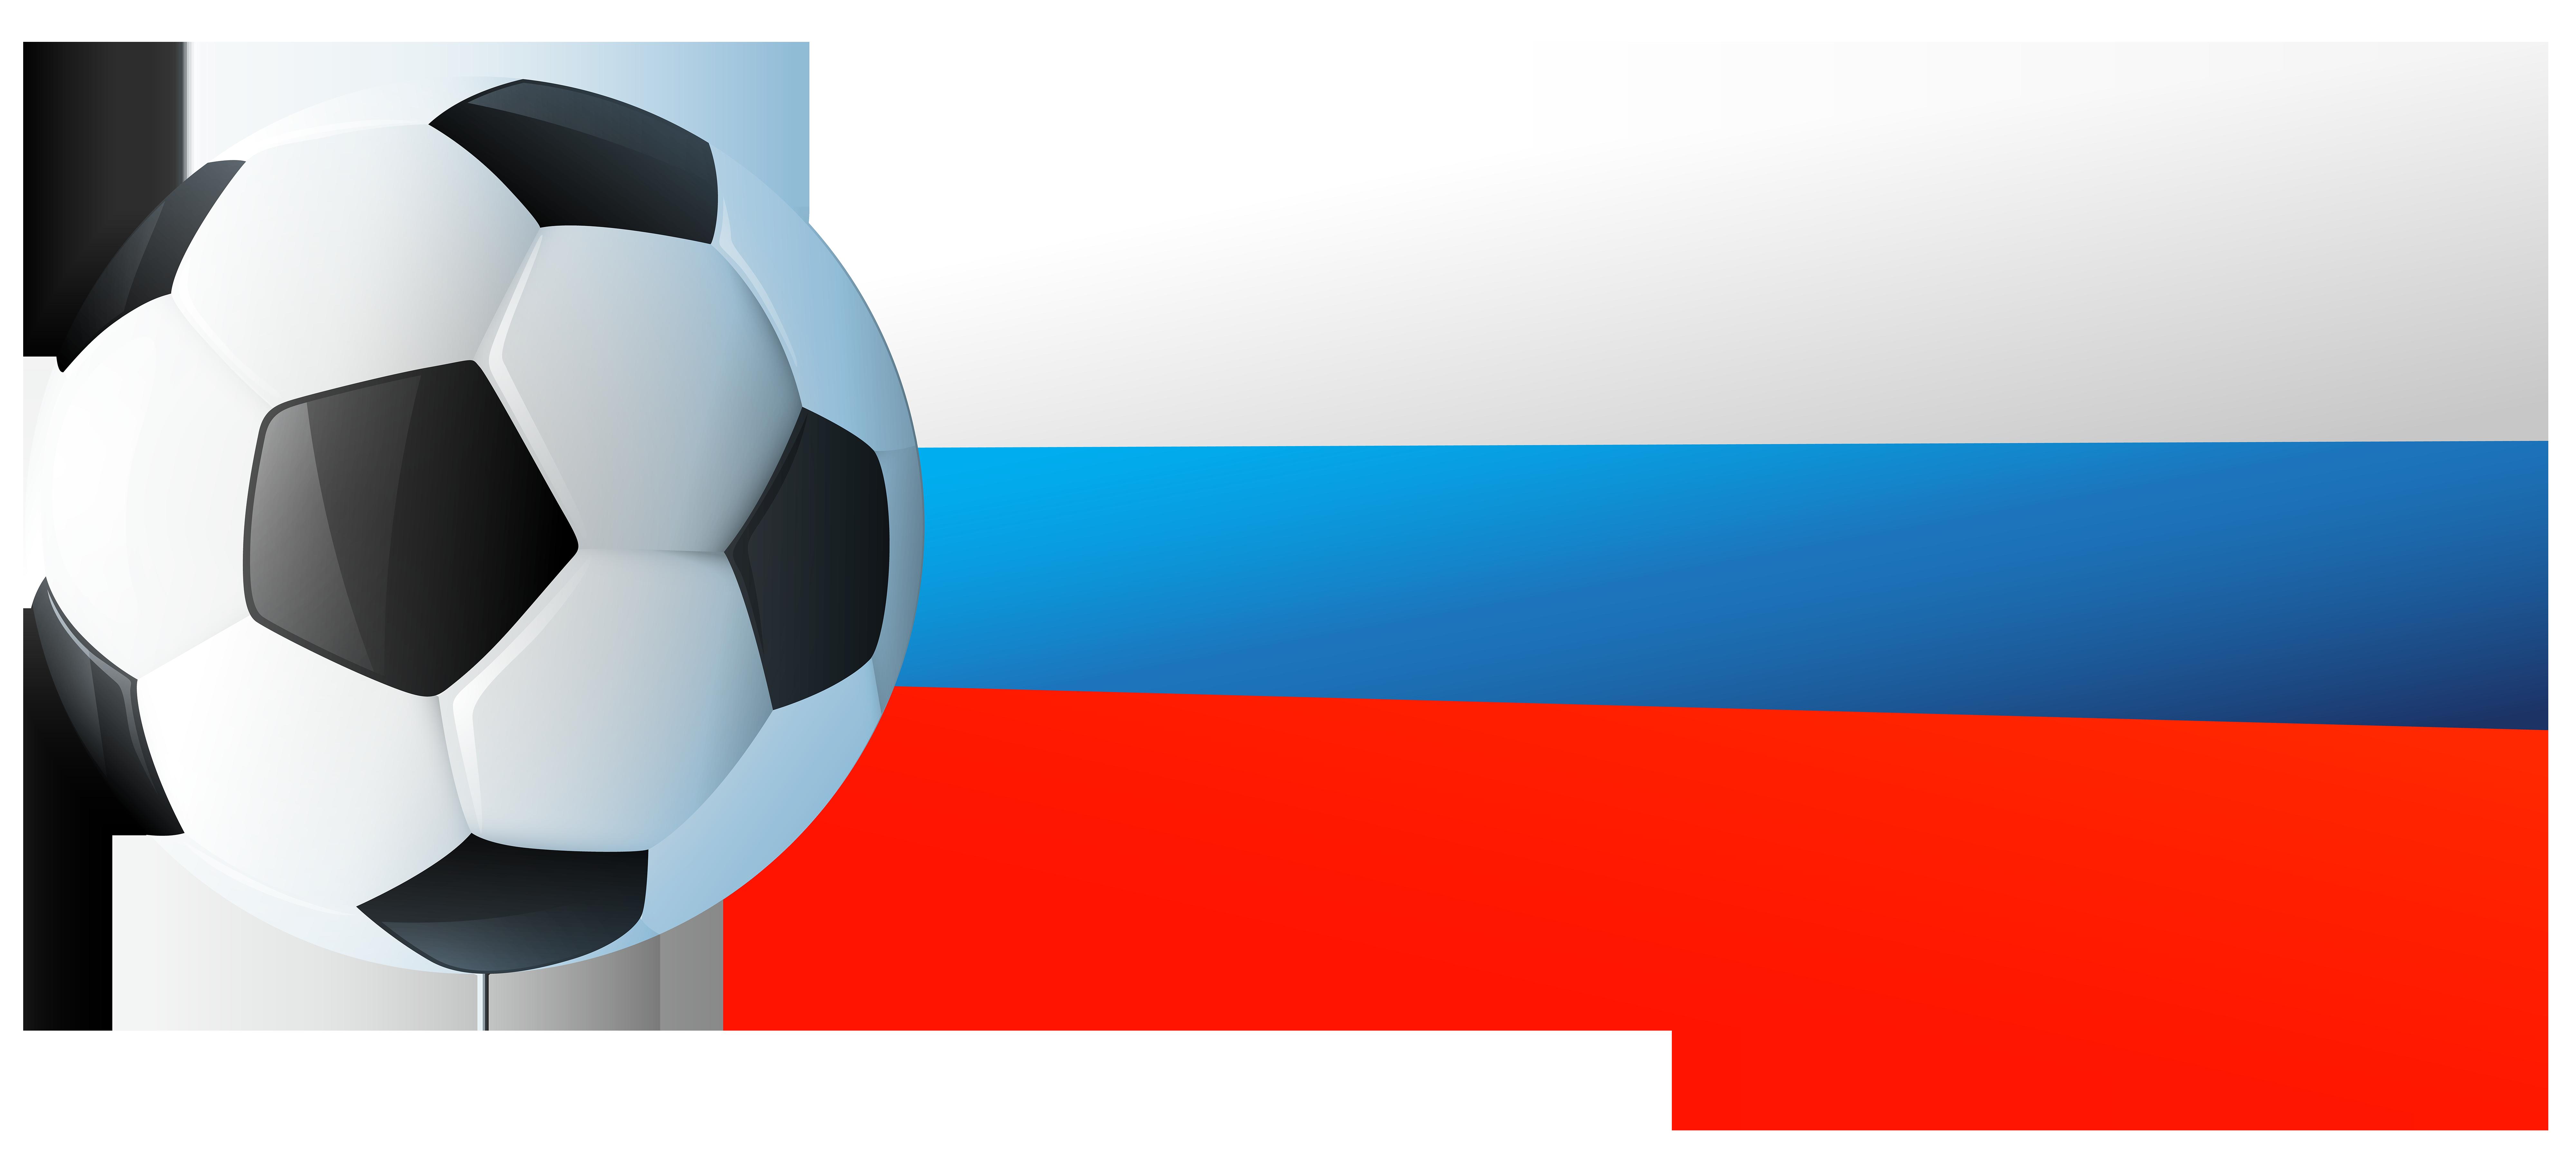 8000x3604 Russian Flag With Soccer Ball Png Clip Art Imageu200b Gallery